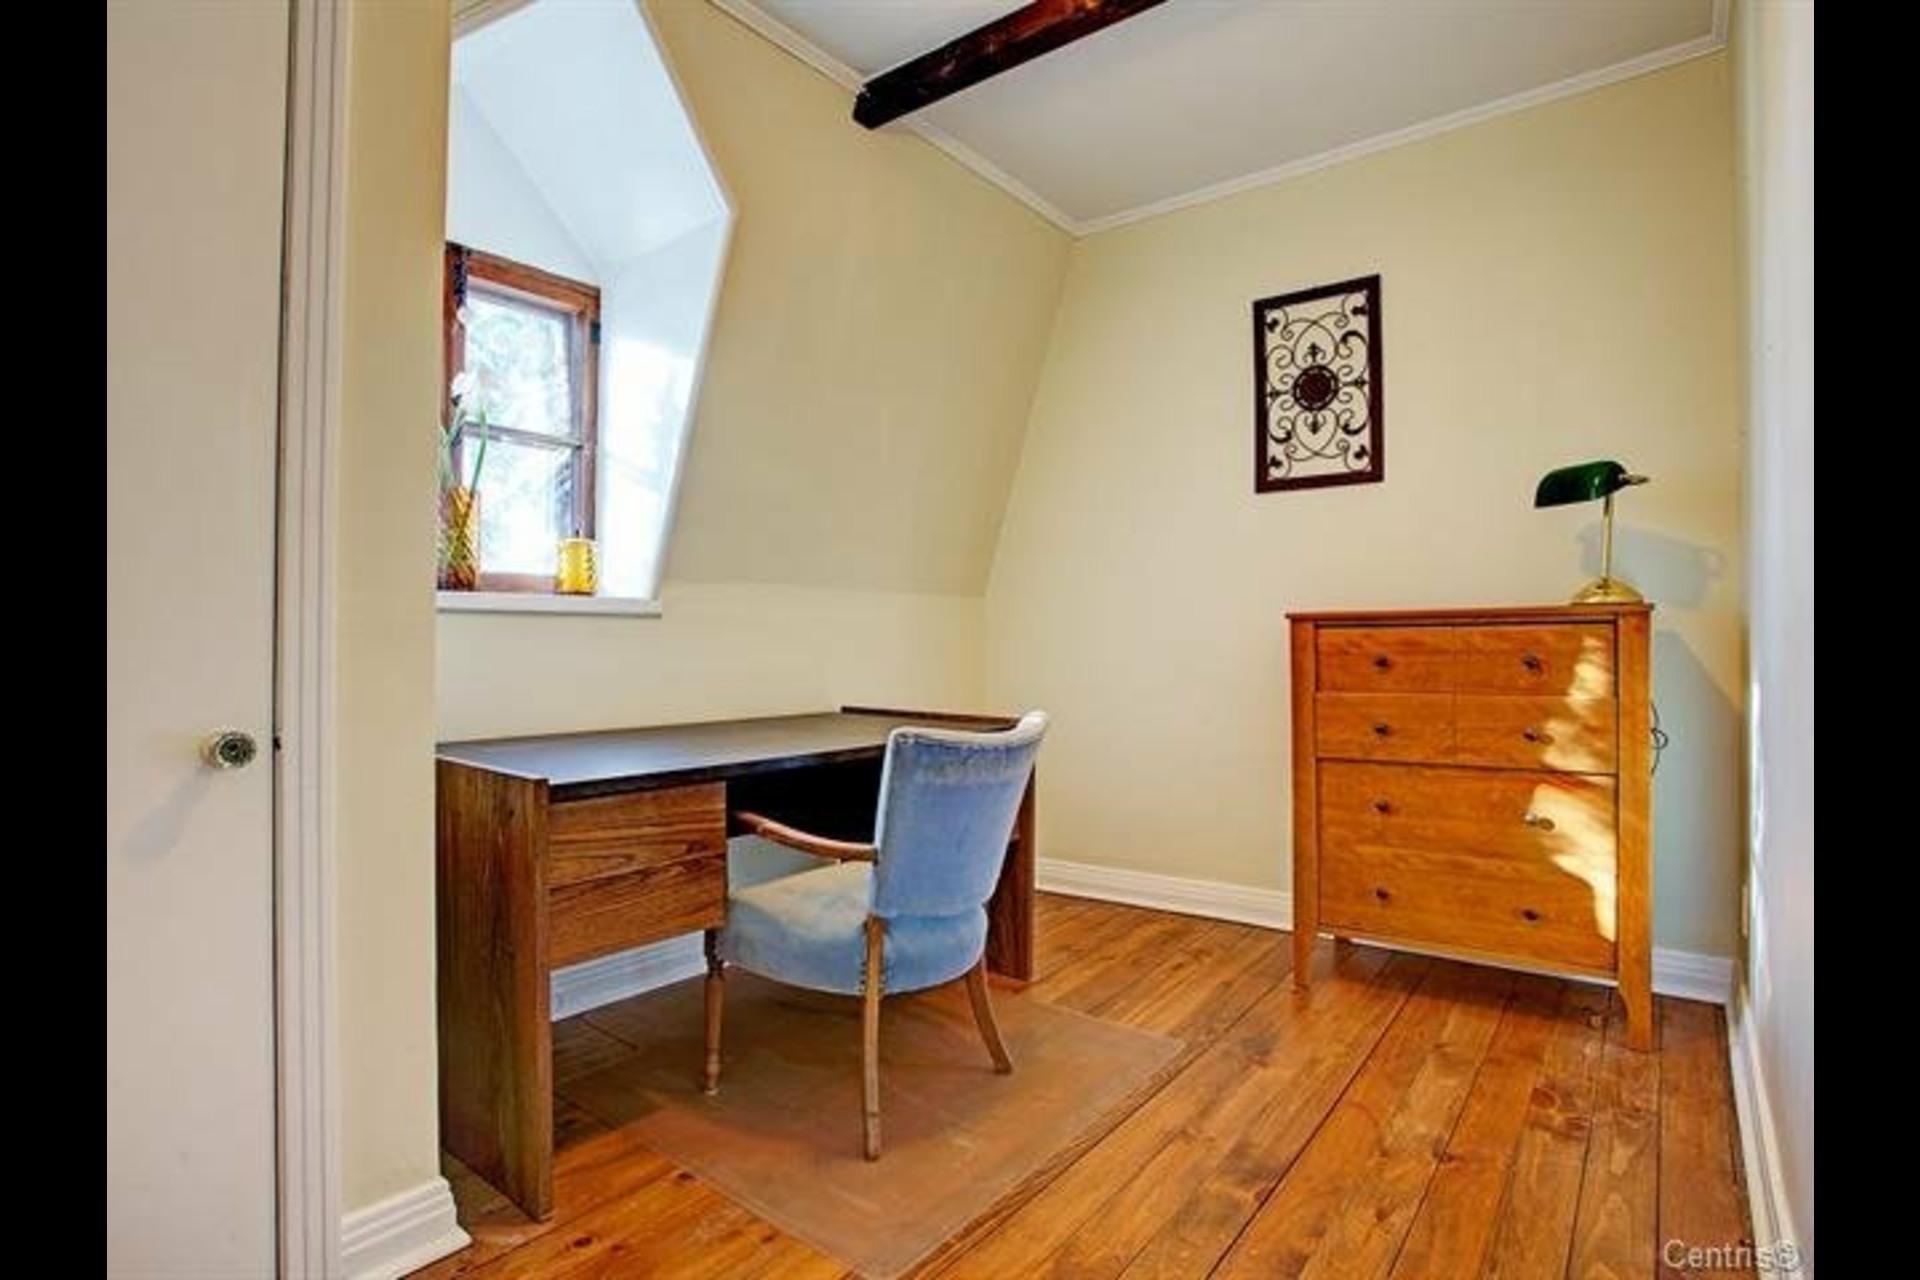 image 16 - MX - Casa sola - MX Para alquiler Vaudreuil-Dorion - 12 habitaciones